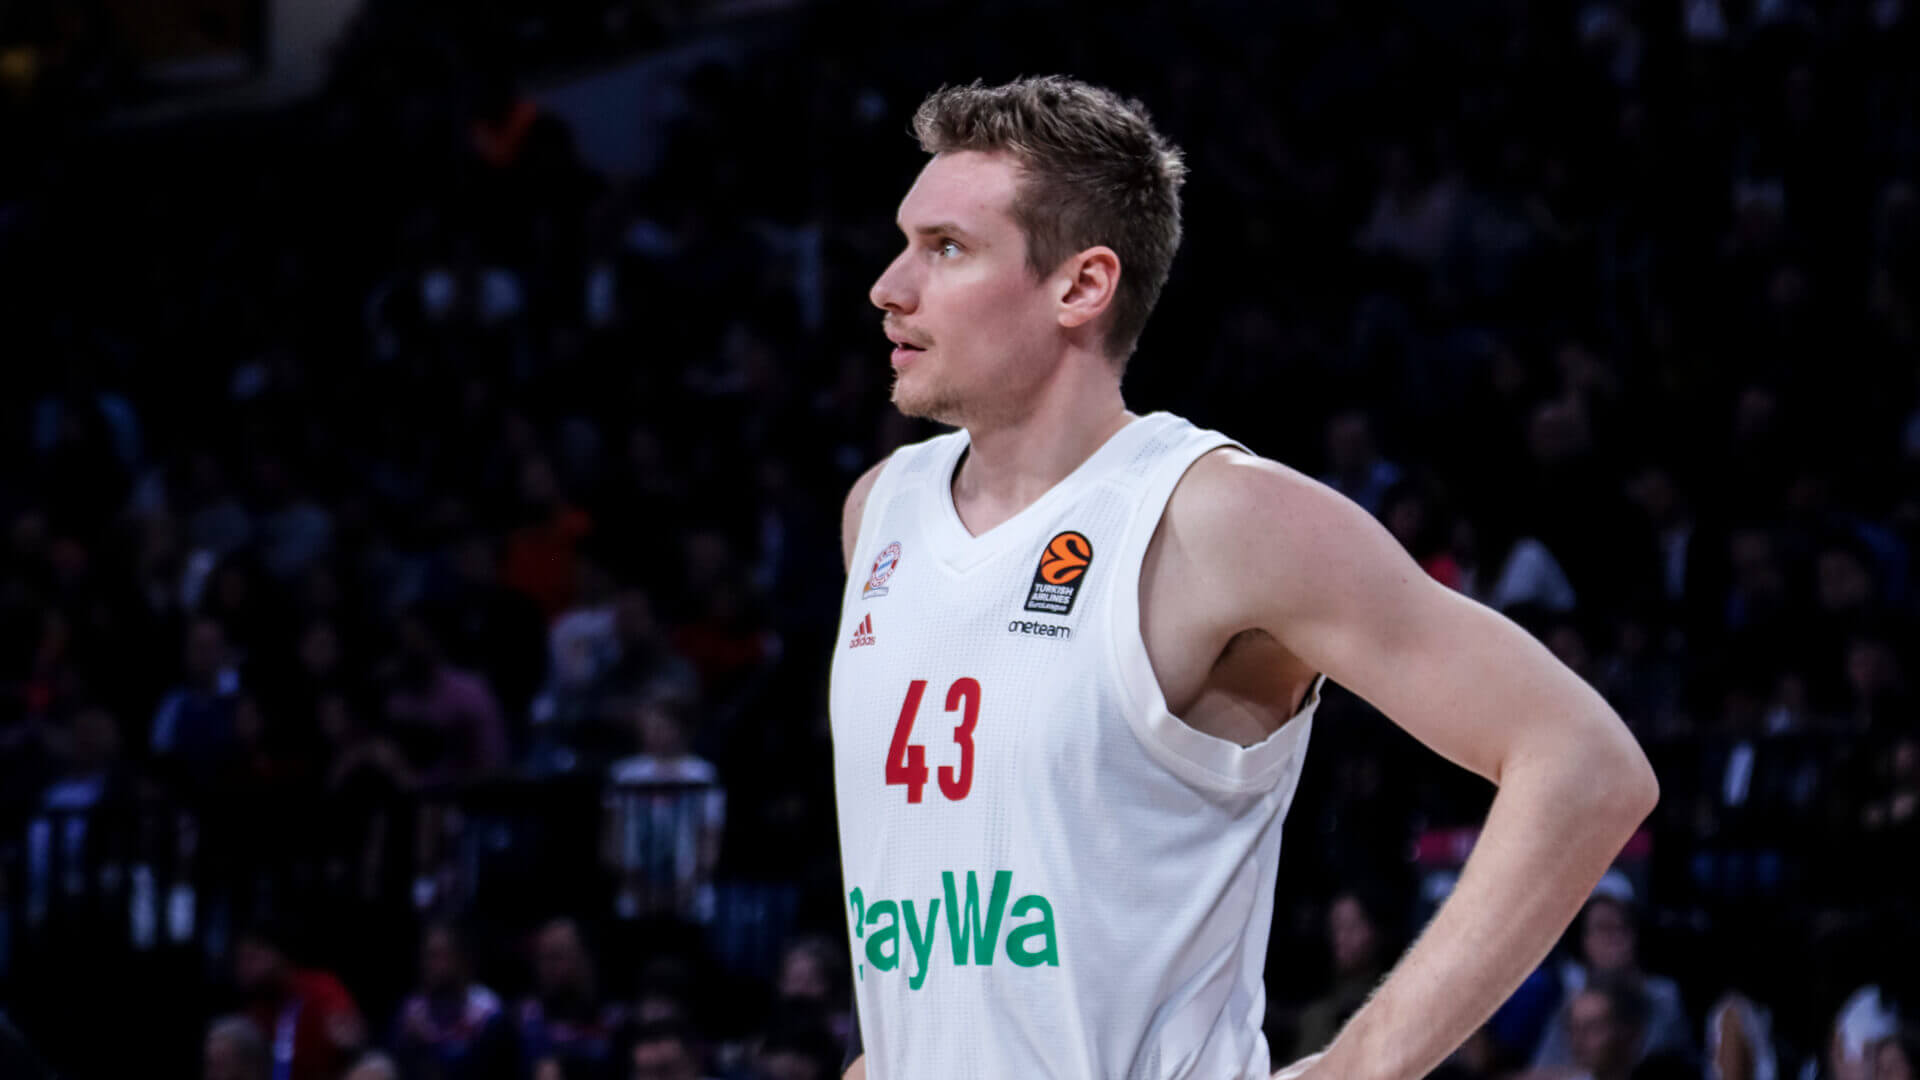 Leon Radošević